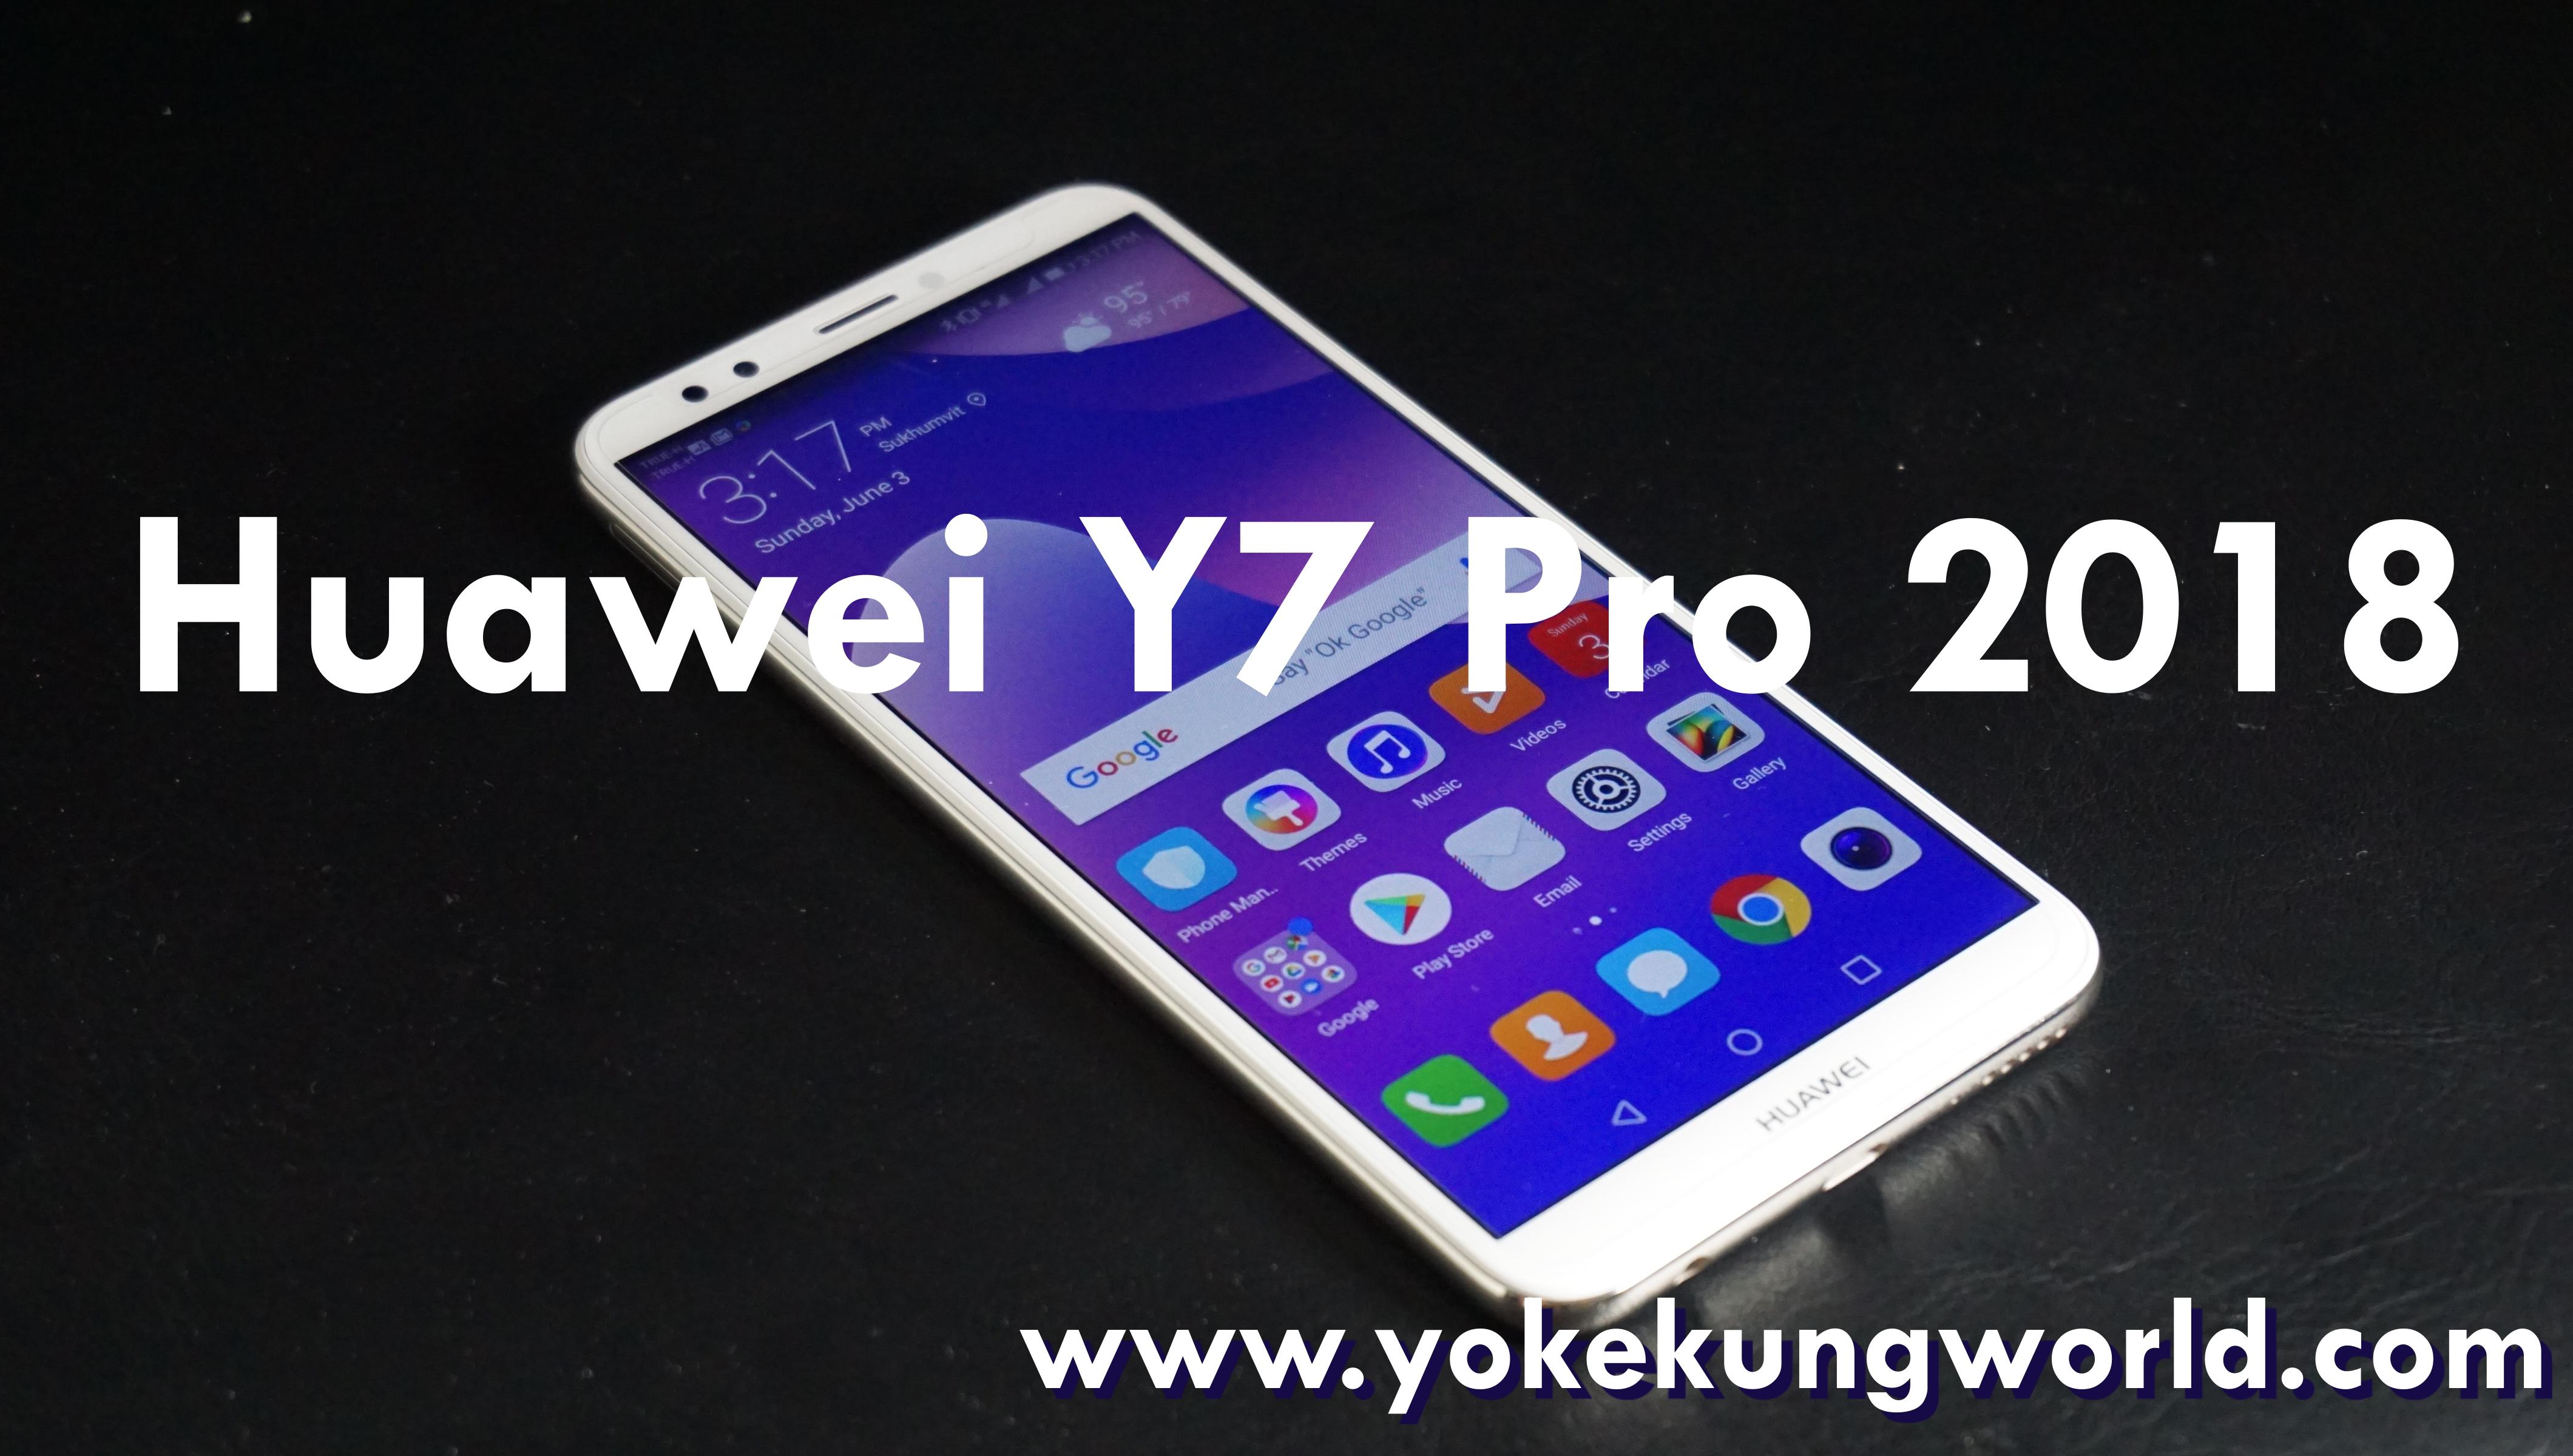 HUAWEI Y7 Pro 2018 มือถือกล้องคู่ จอ FullView Displayราคา 4,990 บาท